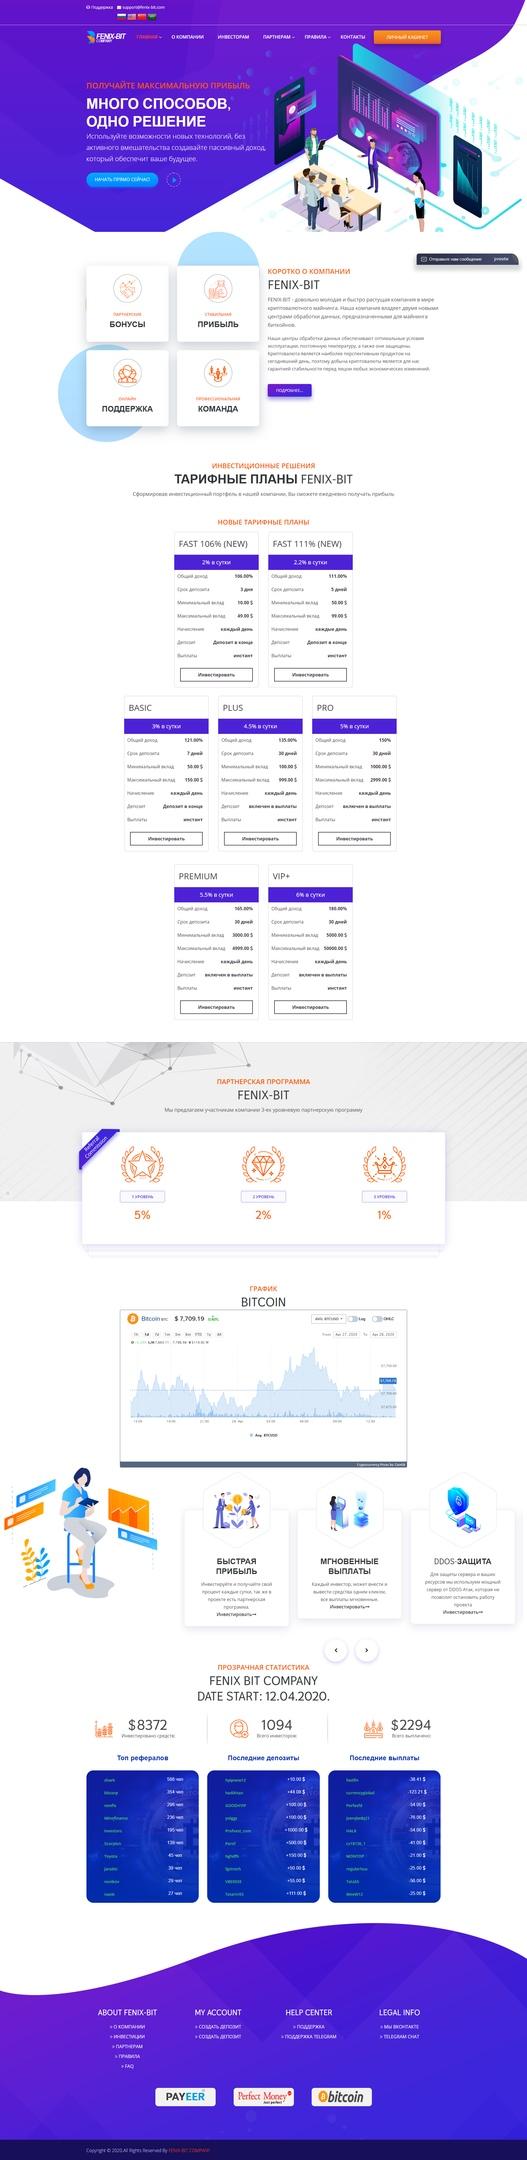 Скрипт инвестиционного проекта FENIX-BIT